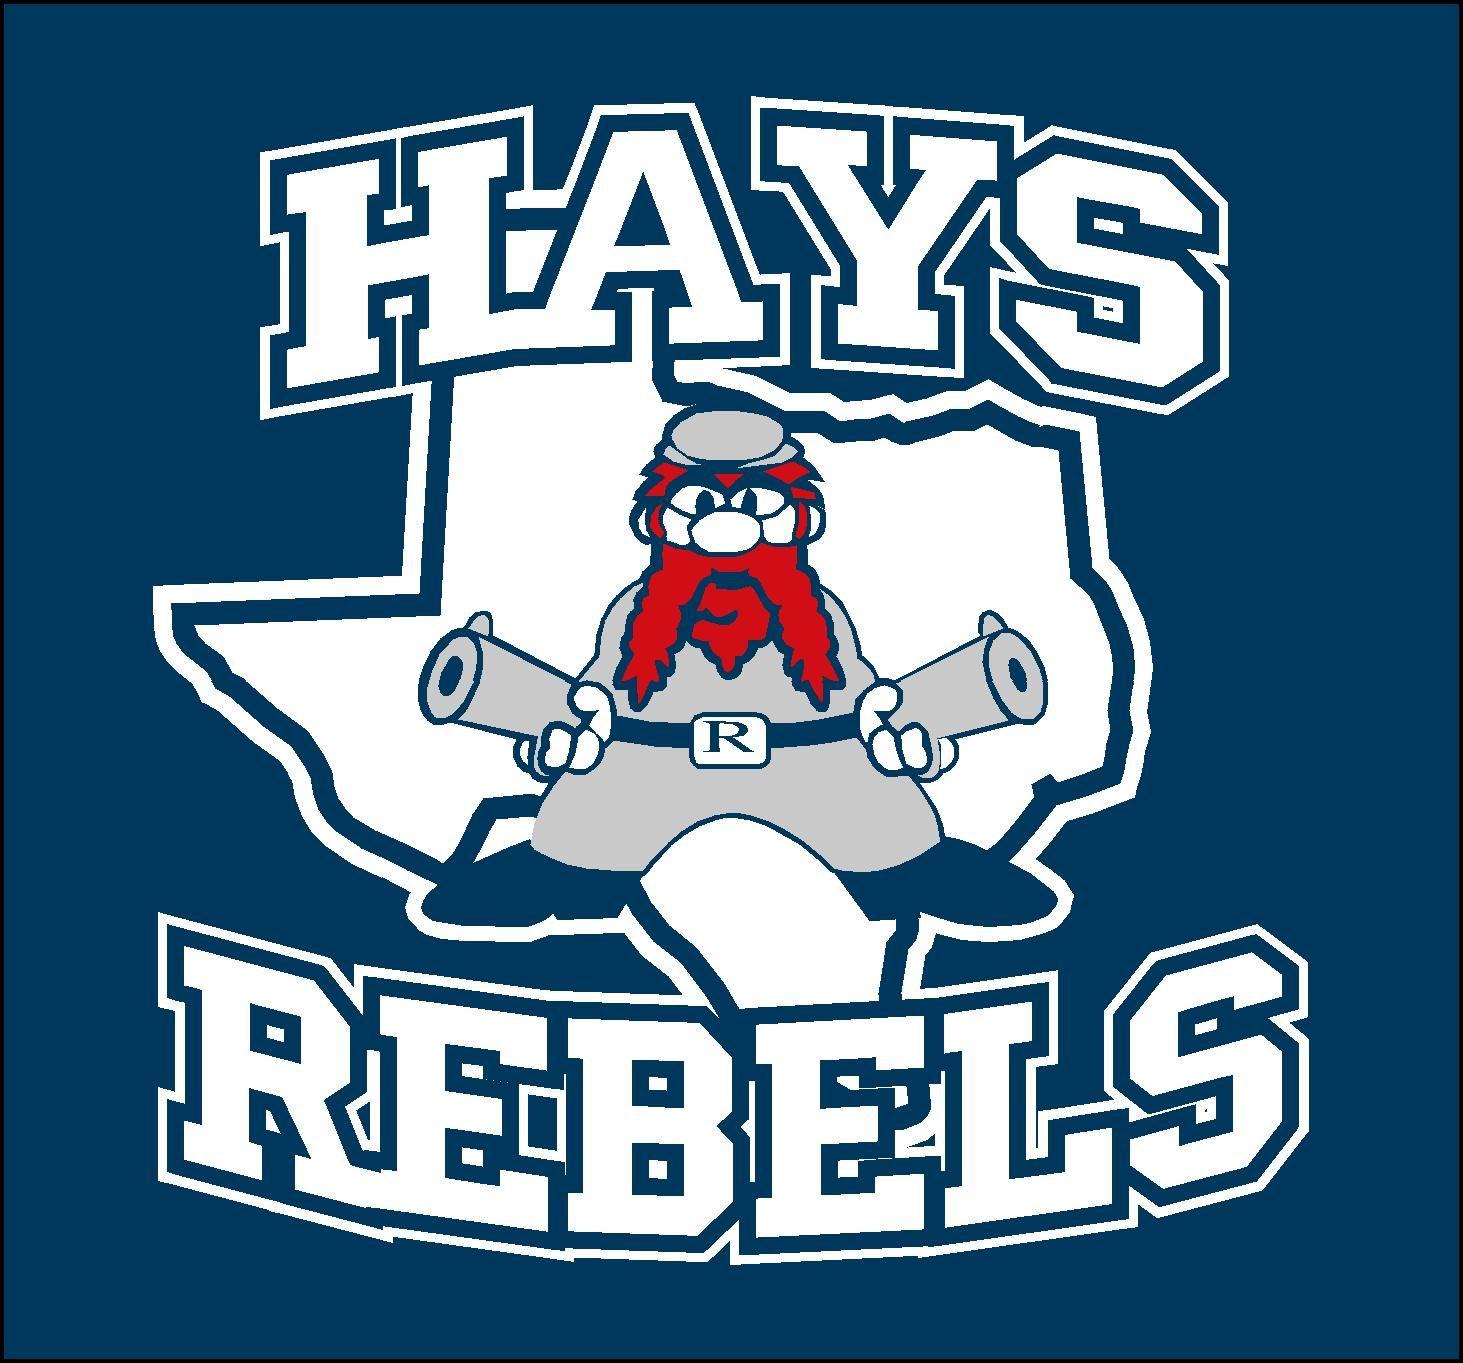 Hays High School - Hays Rebels JV Football